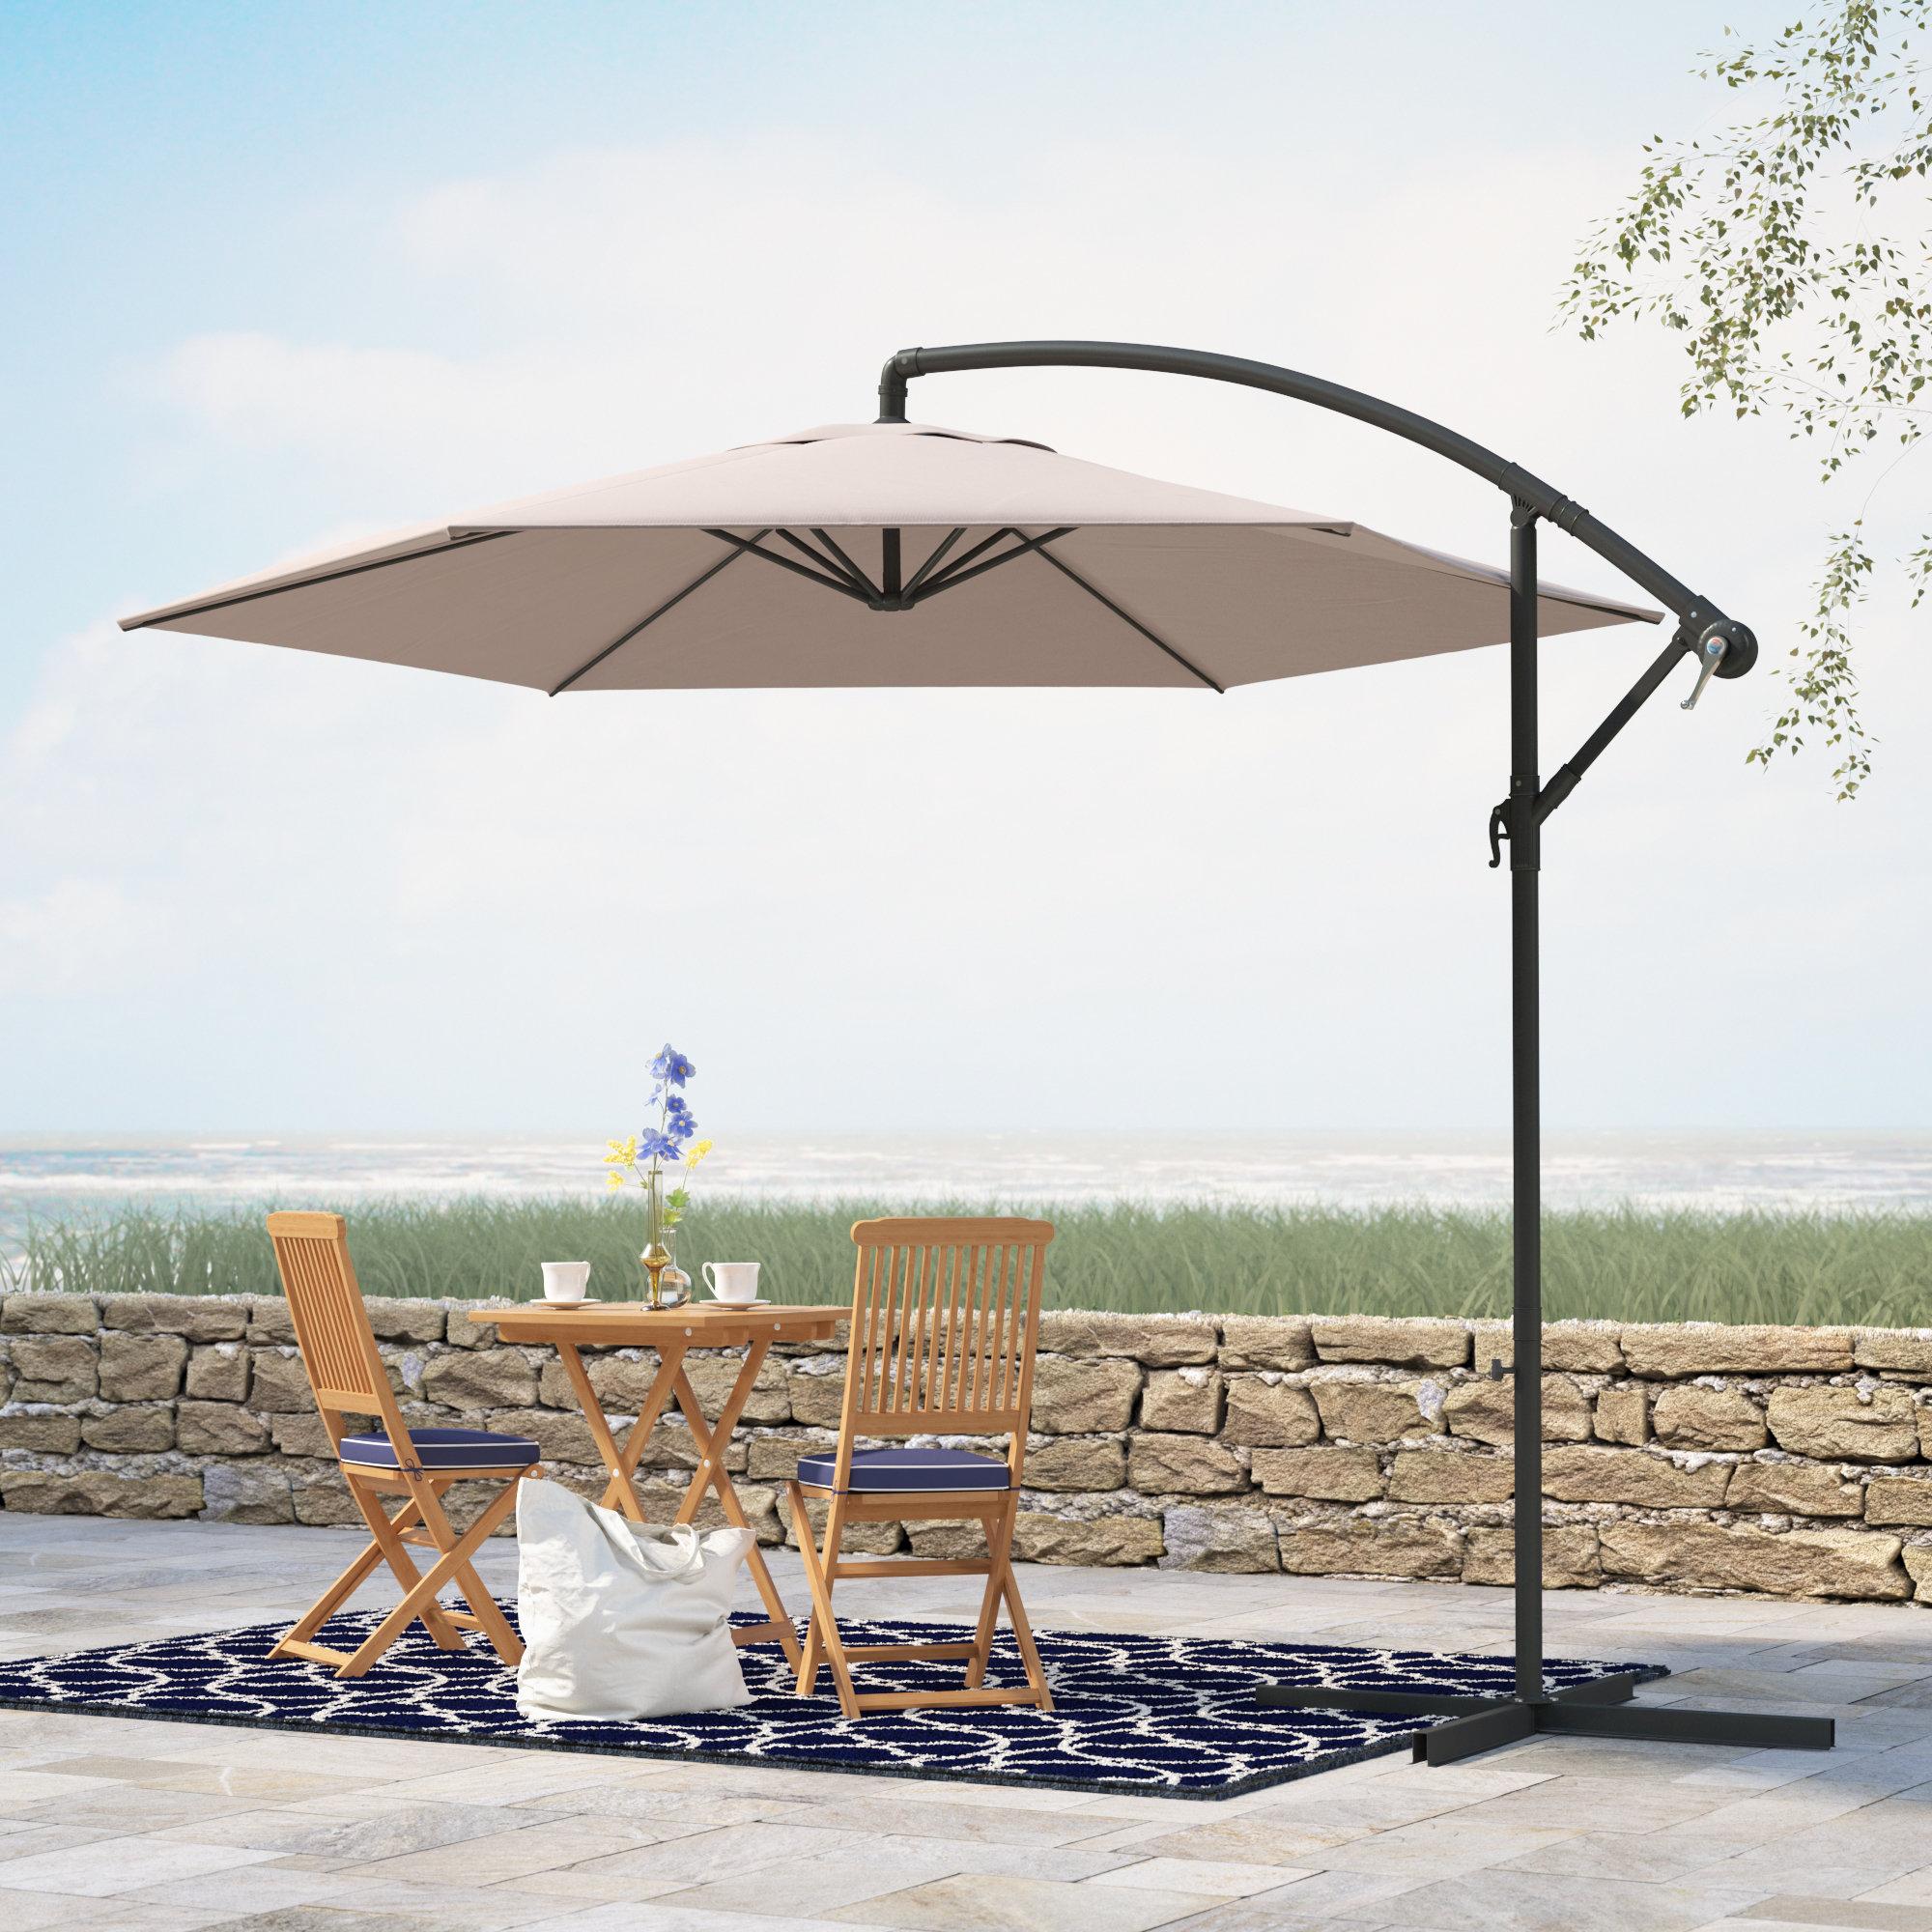 Iyanna Cantilever Umbrellas With Regard To Trendy Alyssa 10' Cantilever Umbrella (View 4 of 20)